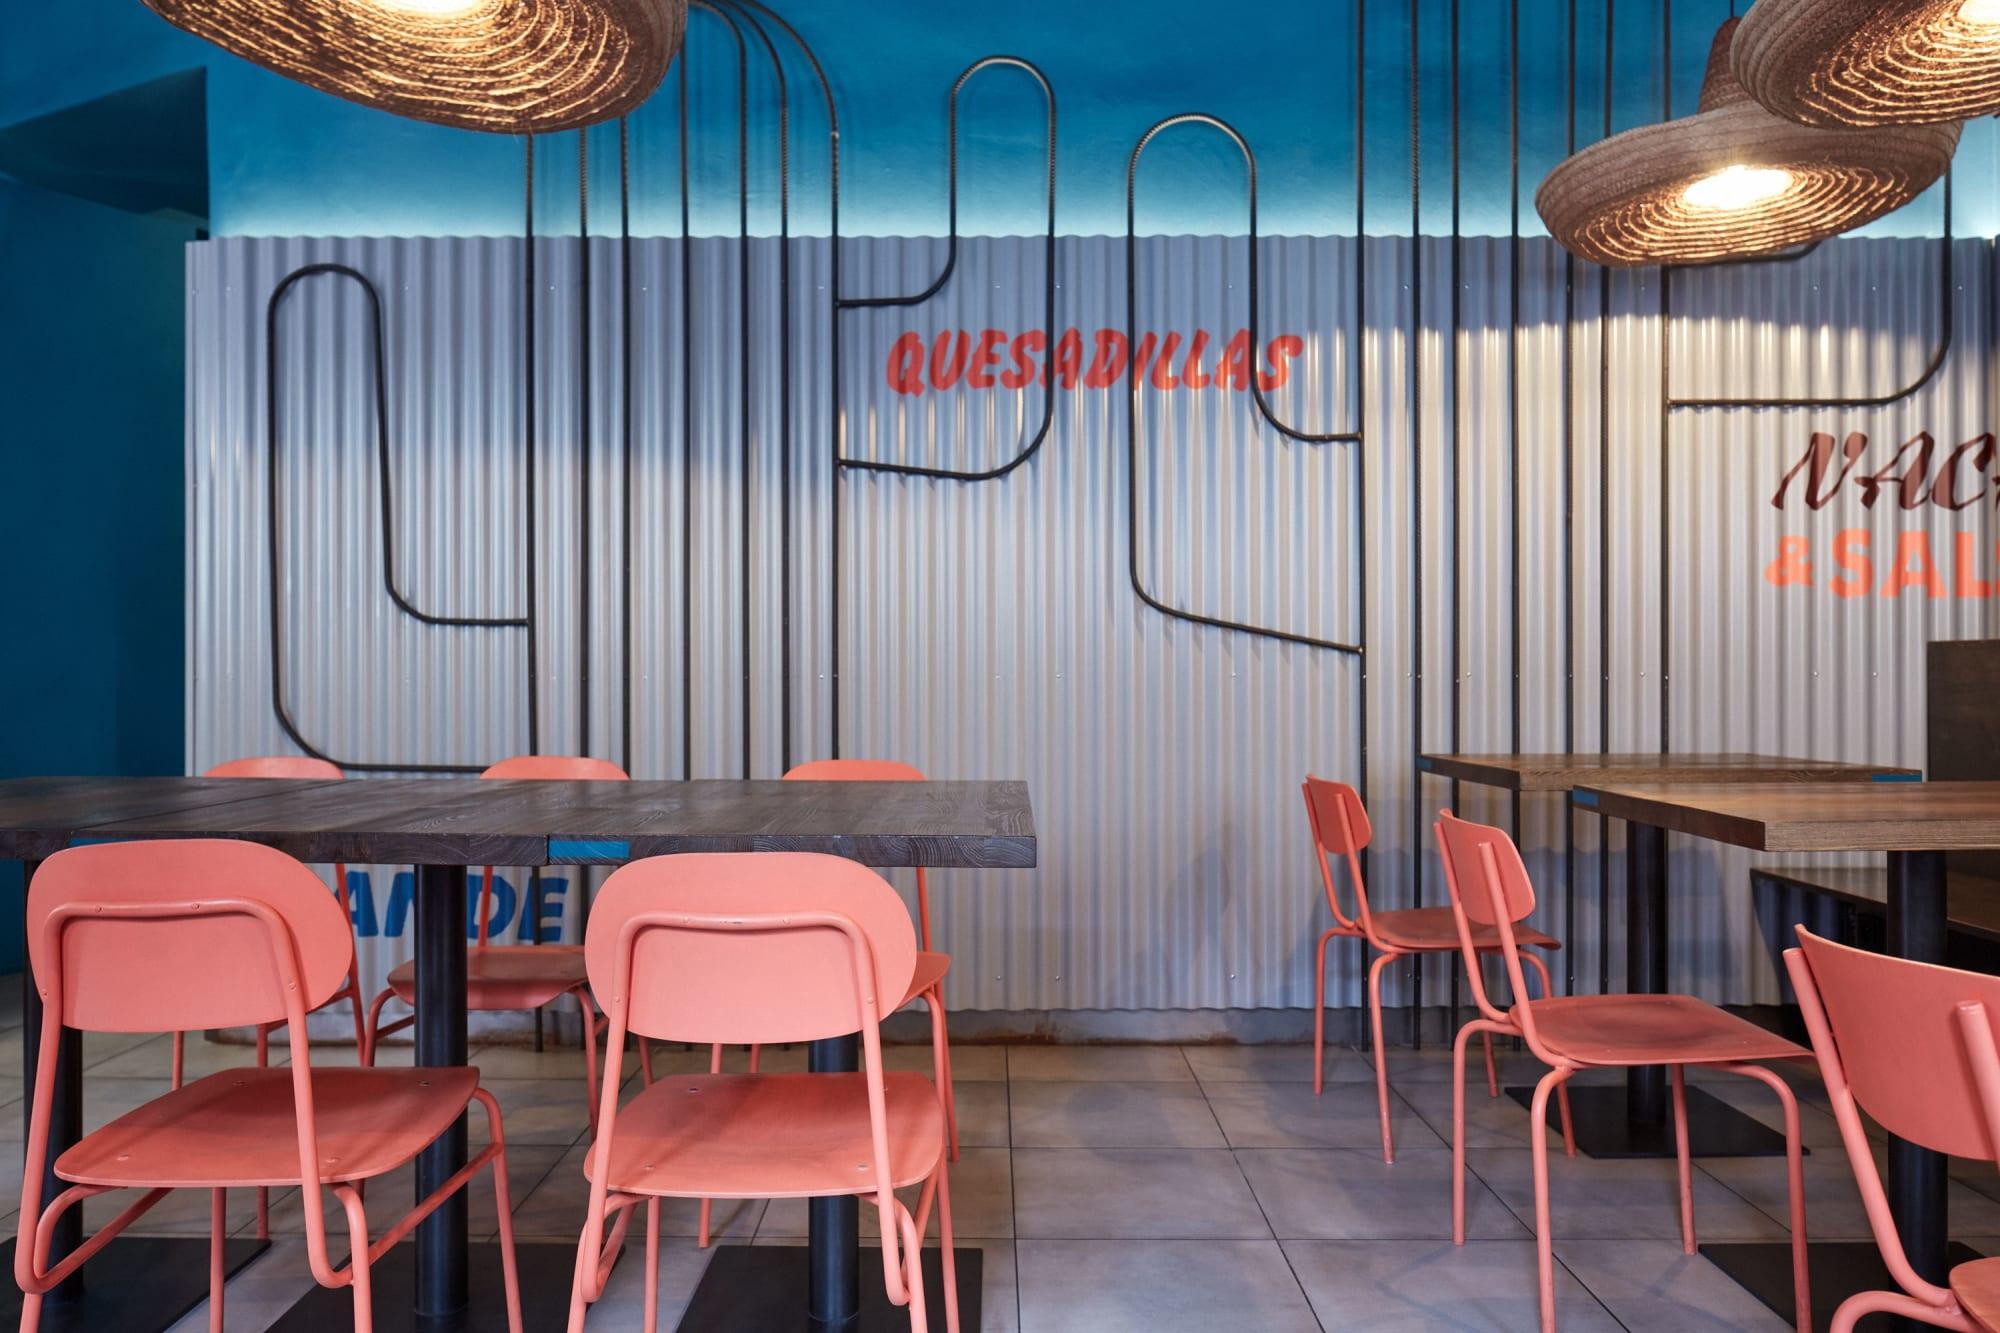 Architecture by formafatal seen at Burrito Loco Seifertova, Praha 3 - Burrito Loco